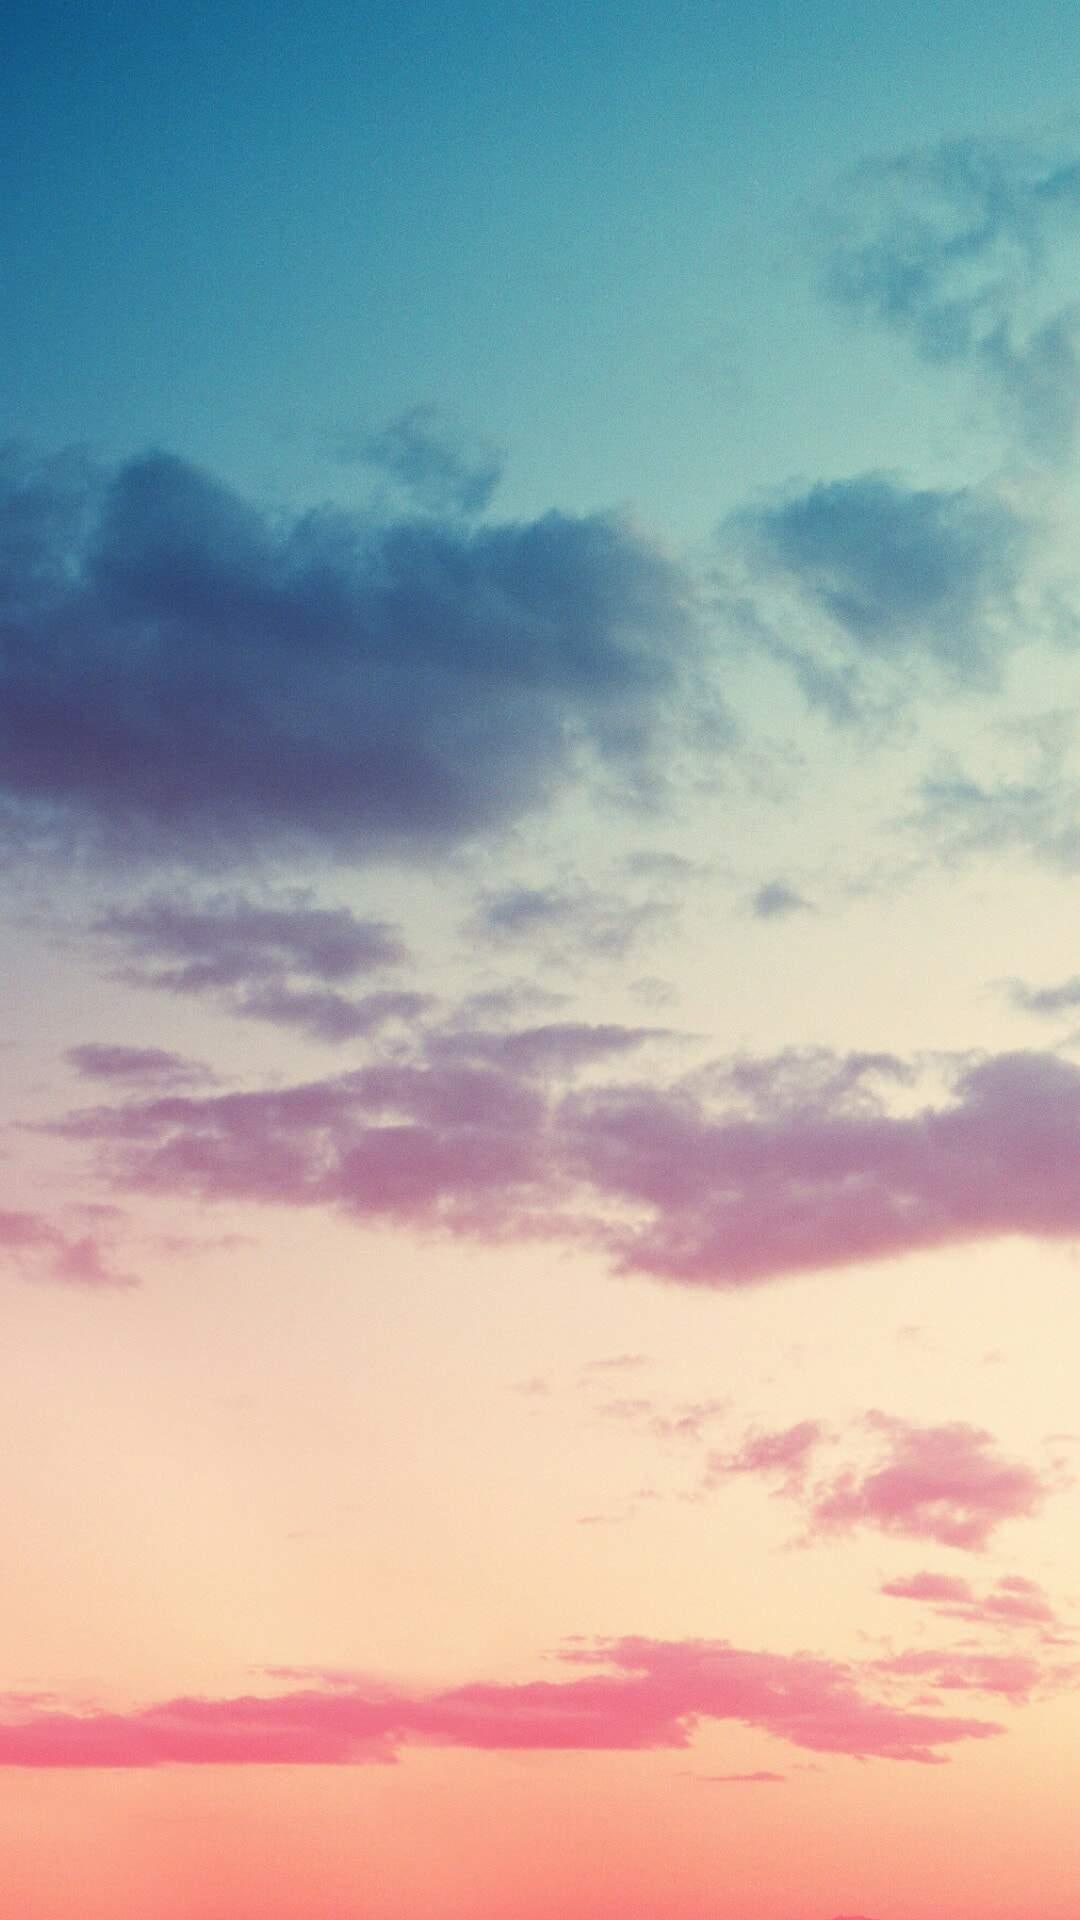 Gradient Cloudy Sky iPhone Wallpaper